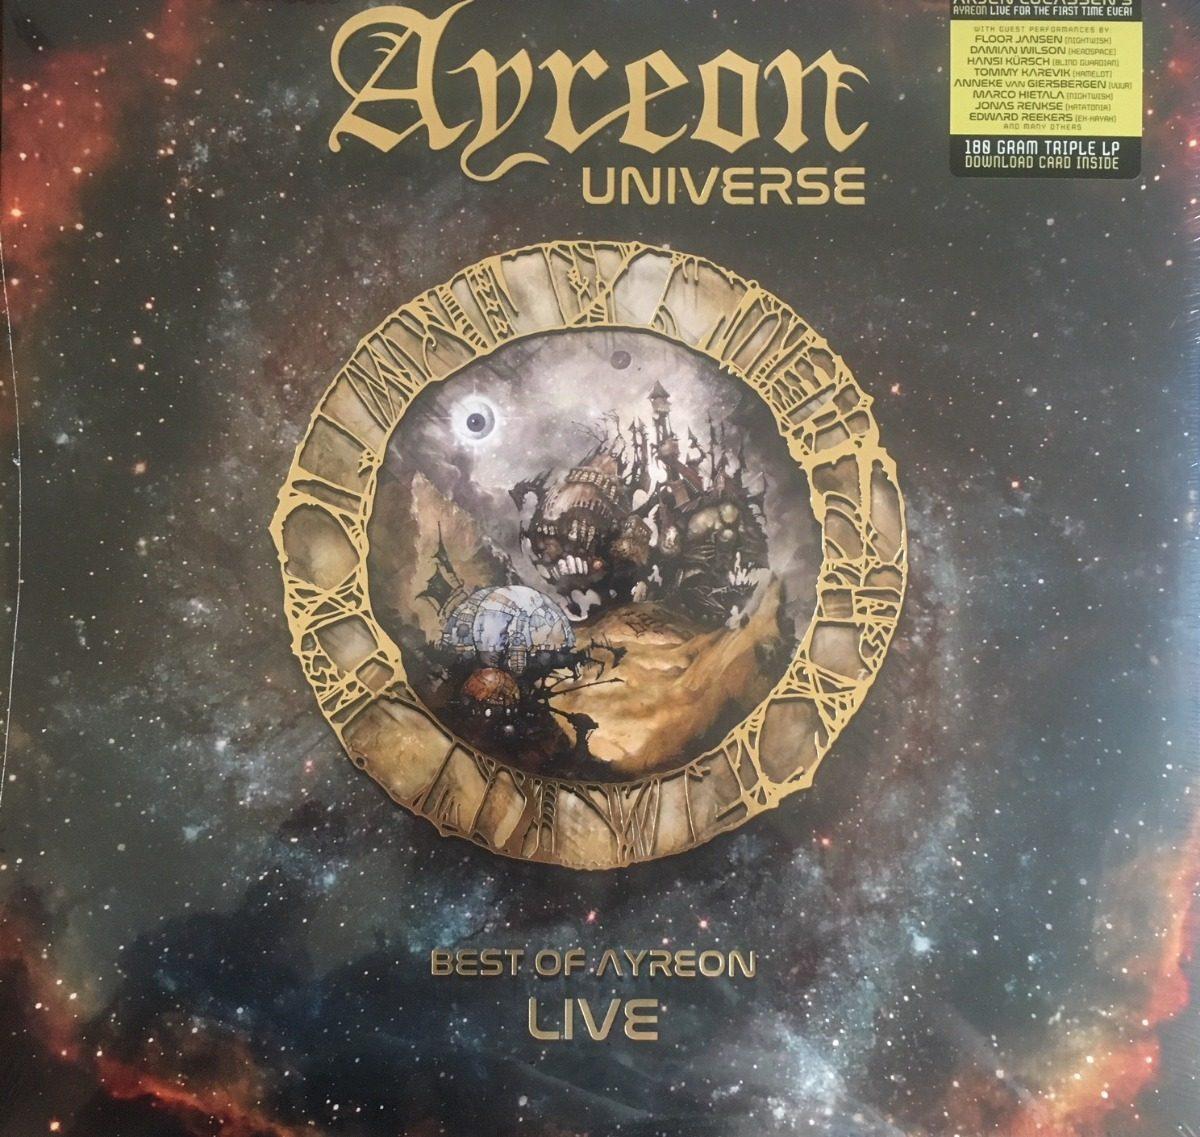 Ayreon Universe Best Of Ayreon Live Ltd 3lp Mp3 Vinyl